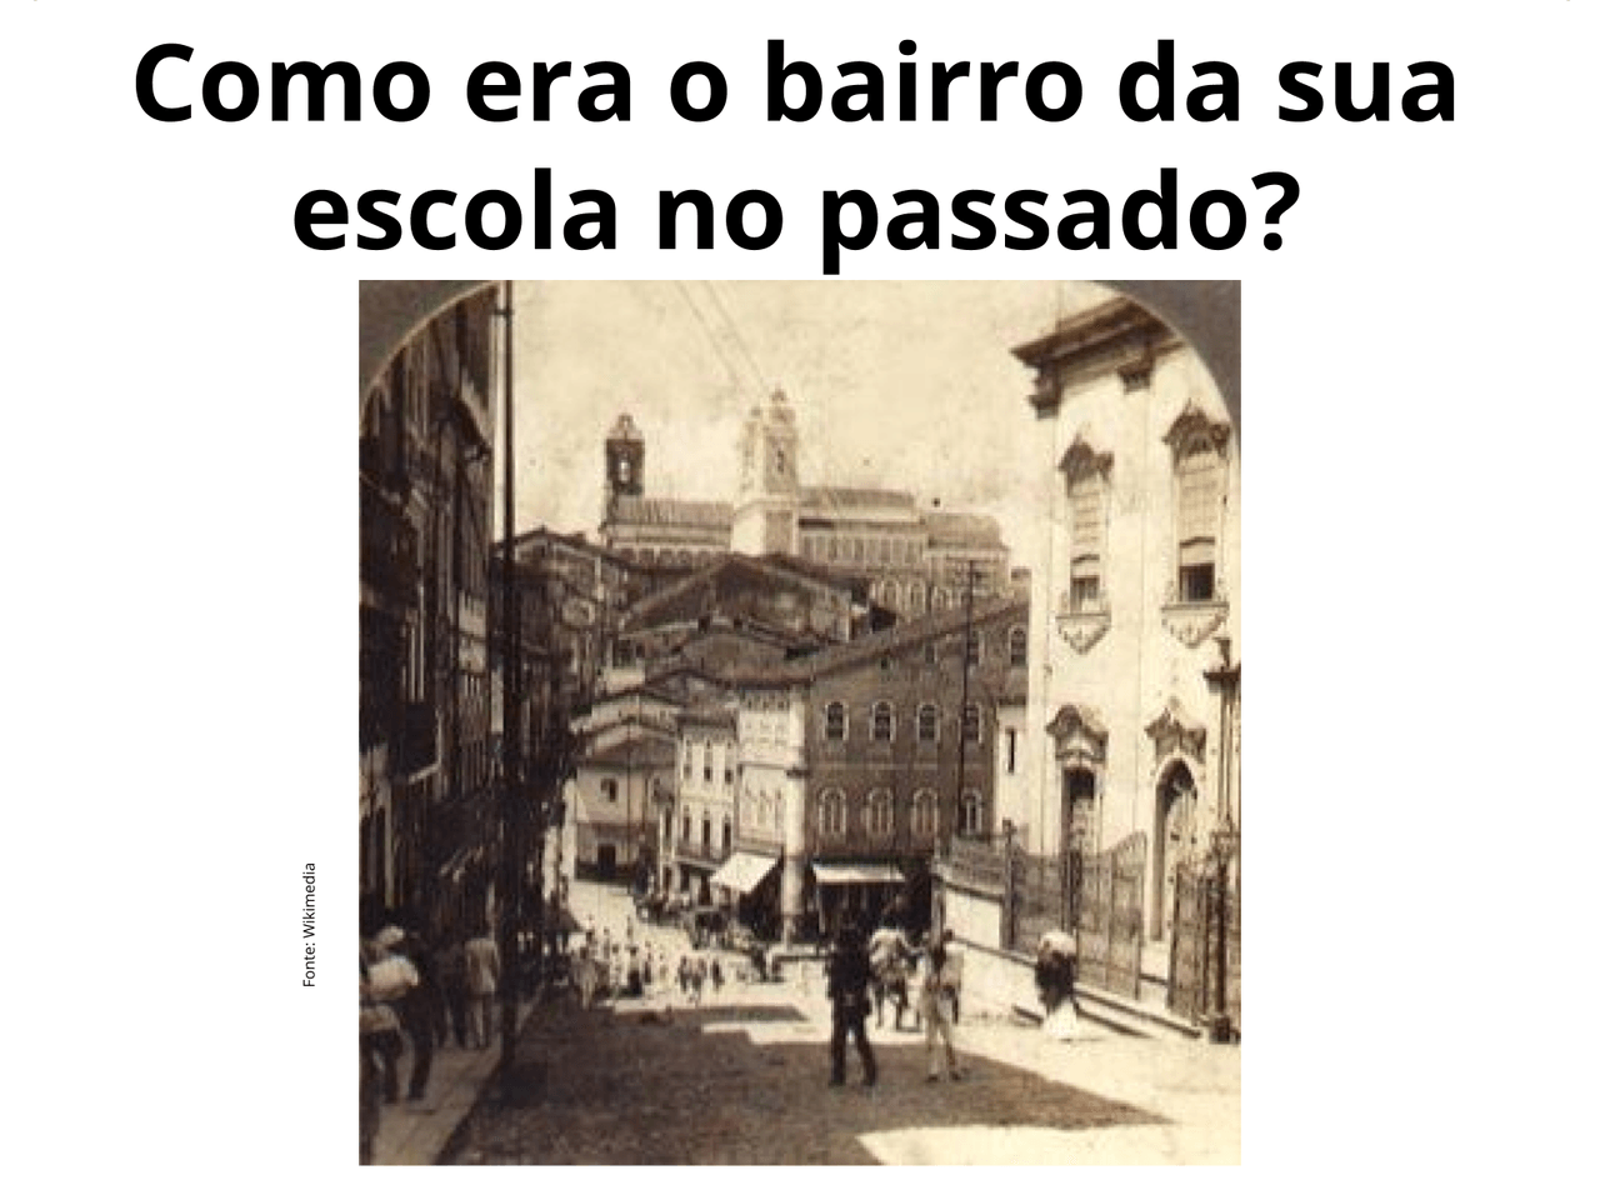 Marco histórico: O Bairro